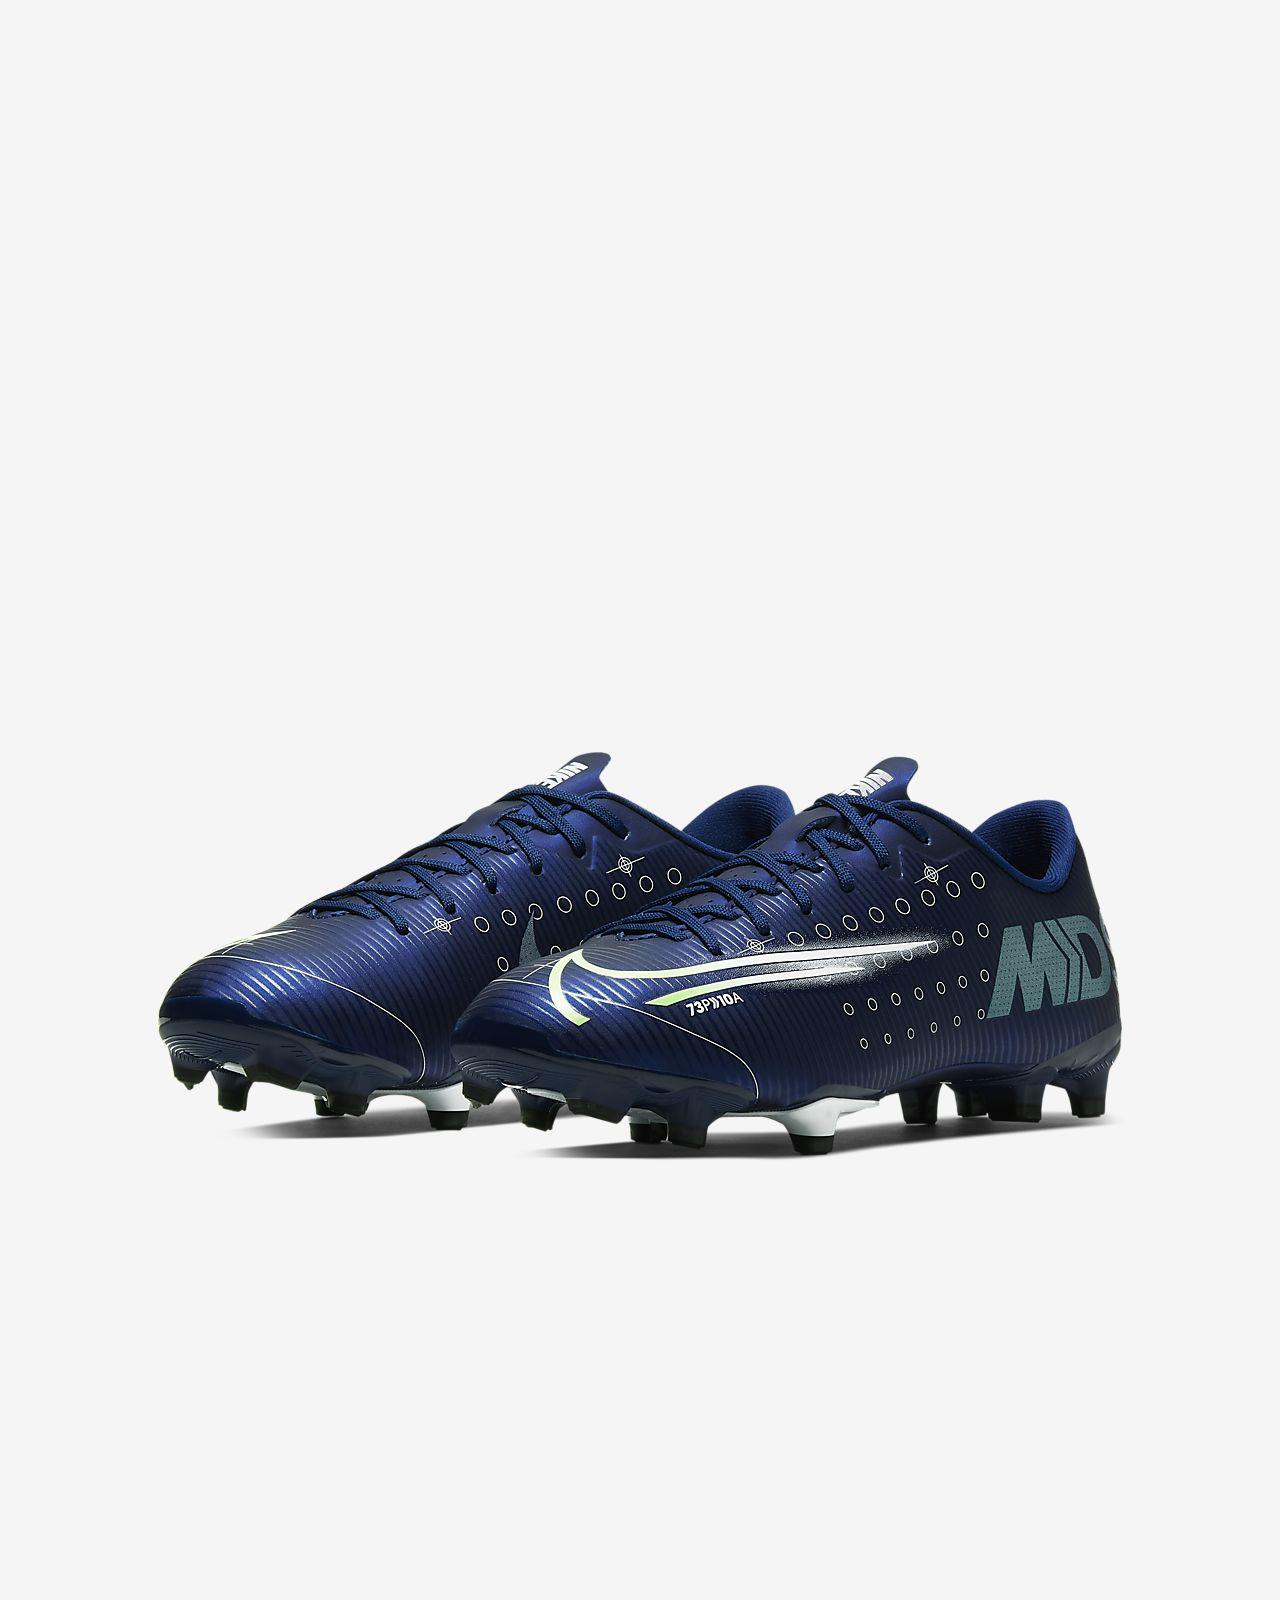 Pour Nike Crampons Surfaces De 13 Chaussure Mg Football KlFJT1c